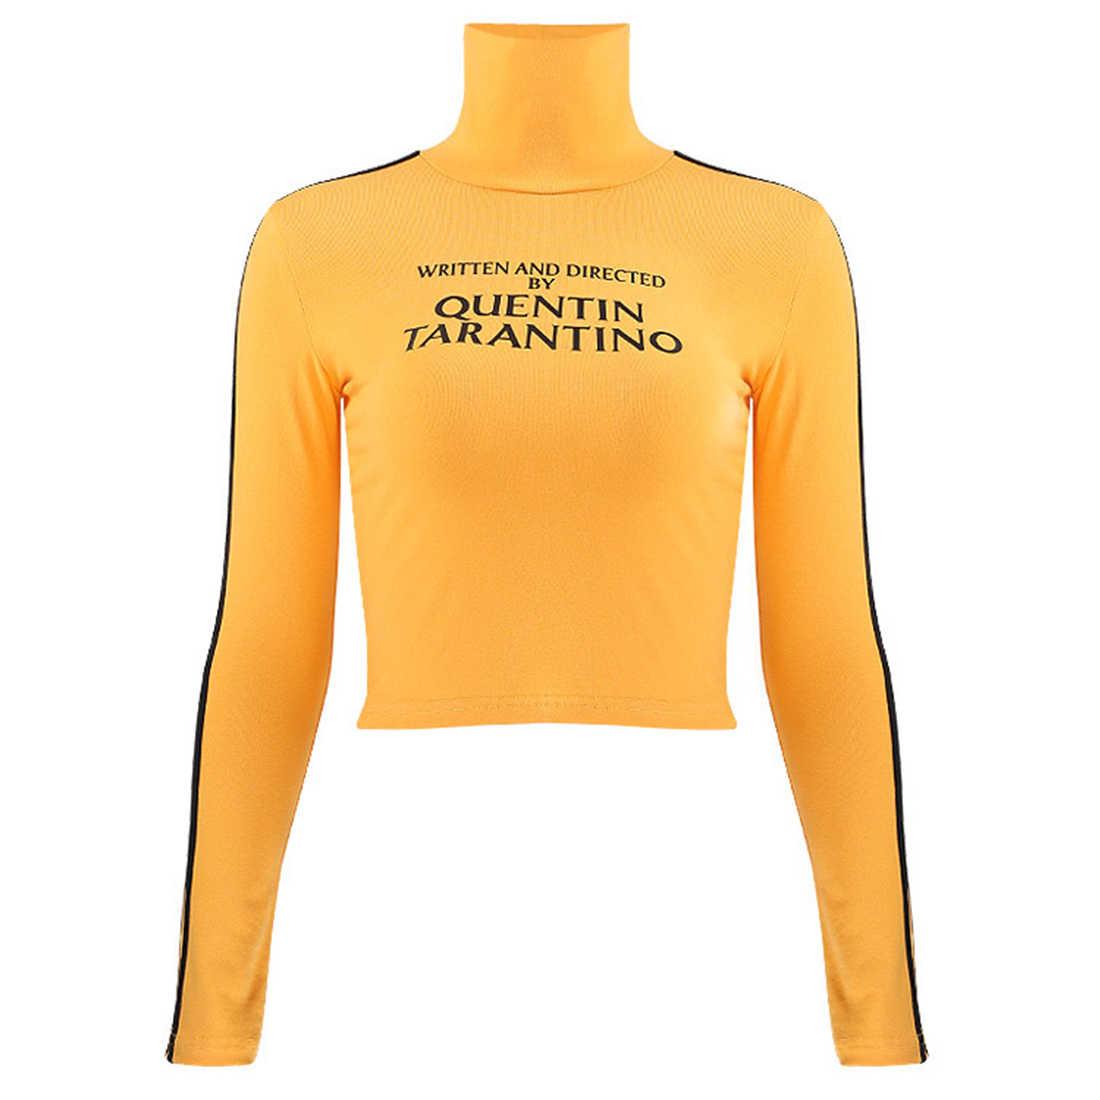 Aelfric 2019 moda Quentin Tarantino Sexy Crop Tops mujer raya lateral manga larga Camiseta cuello de tortuga algodón Camiseta corta señora